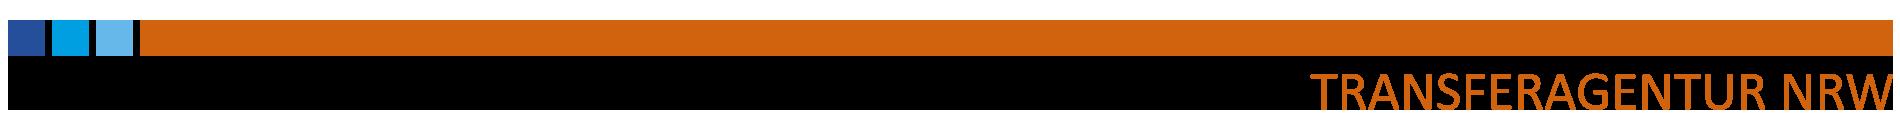 Transferagentur Logo